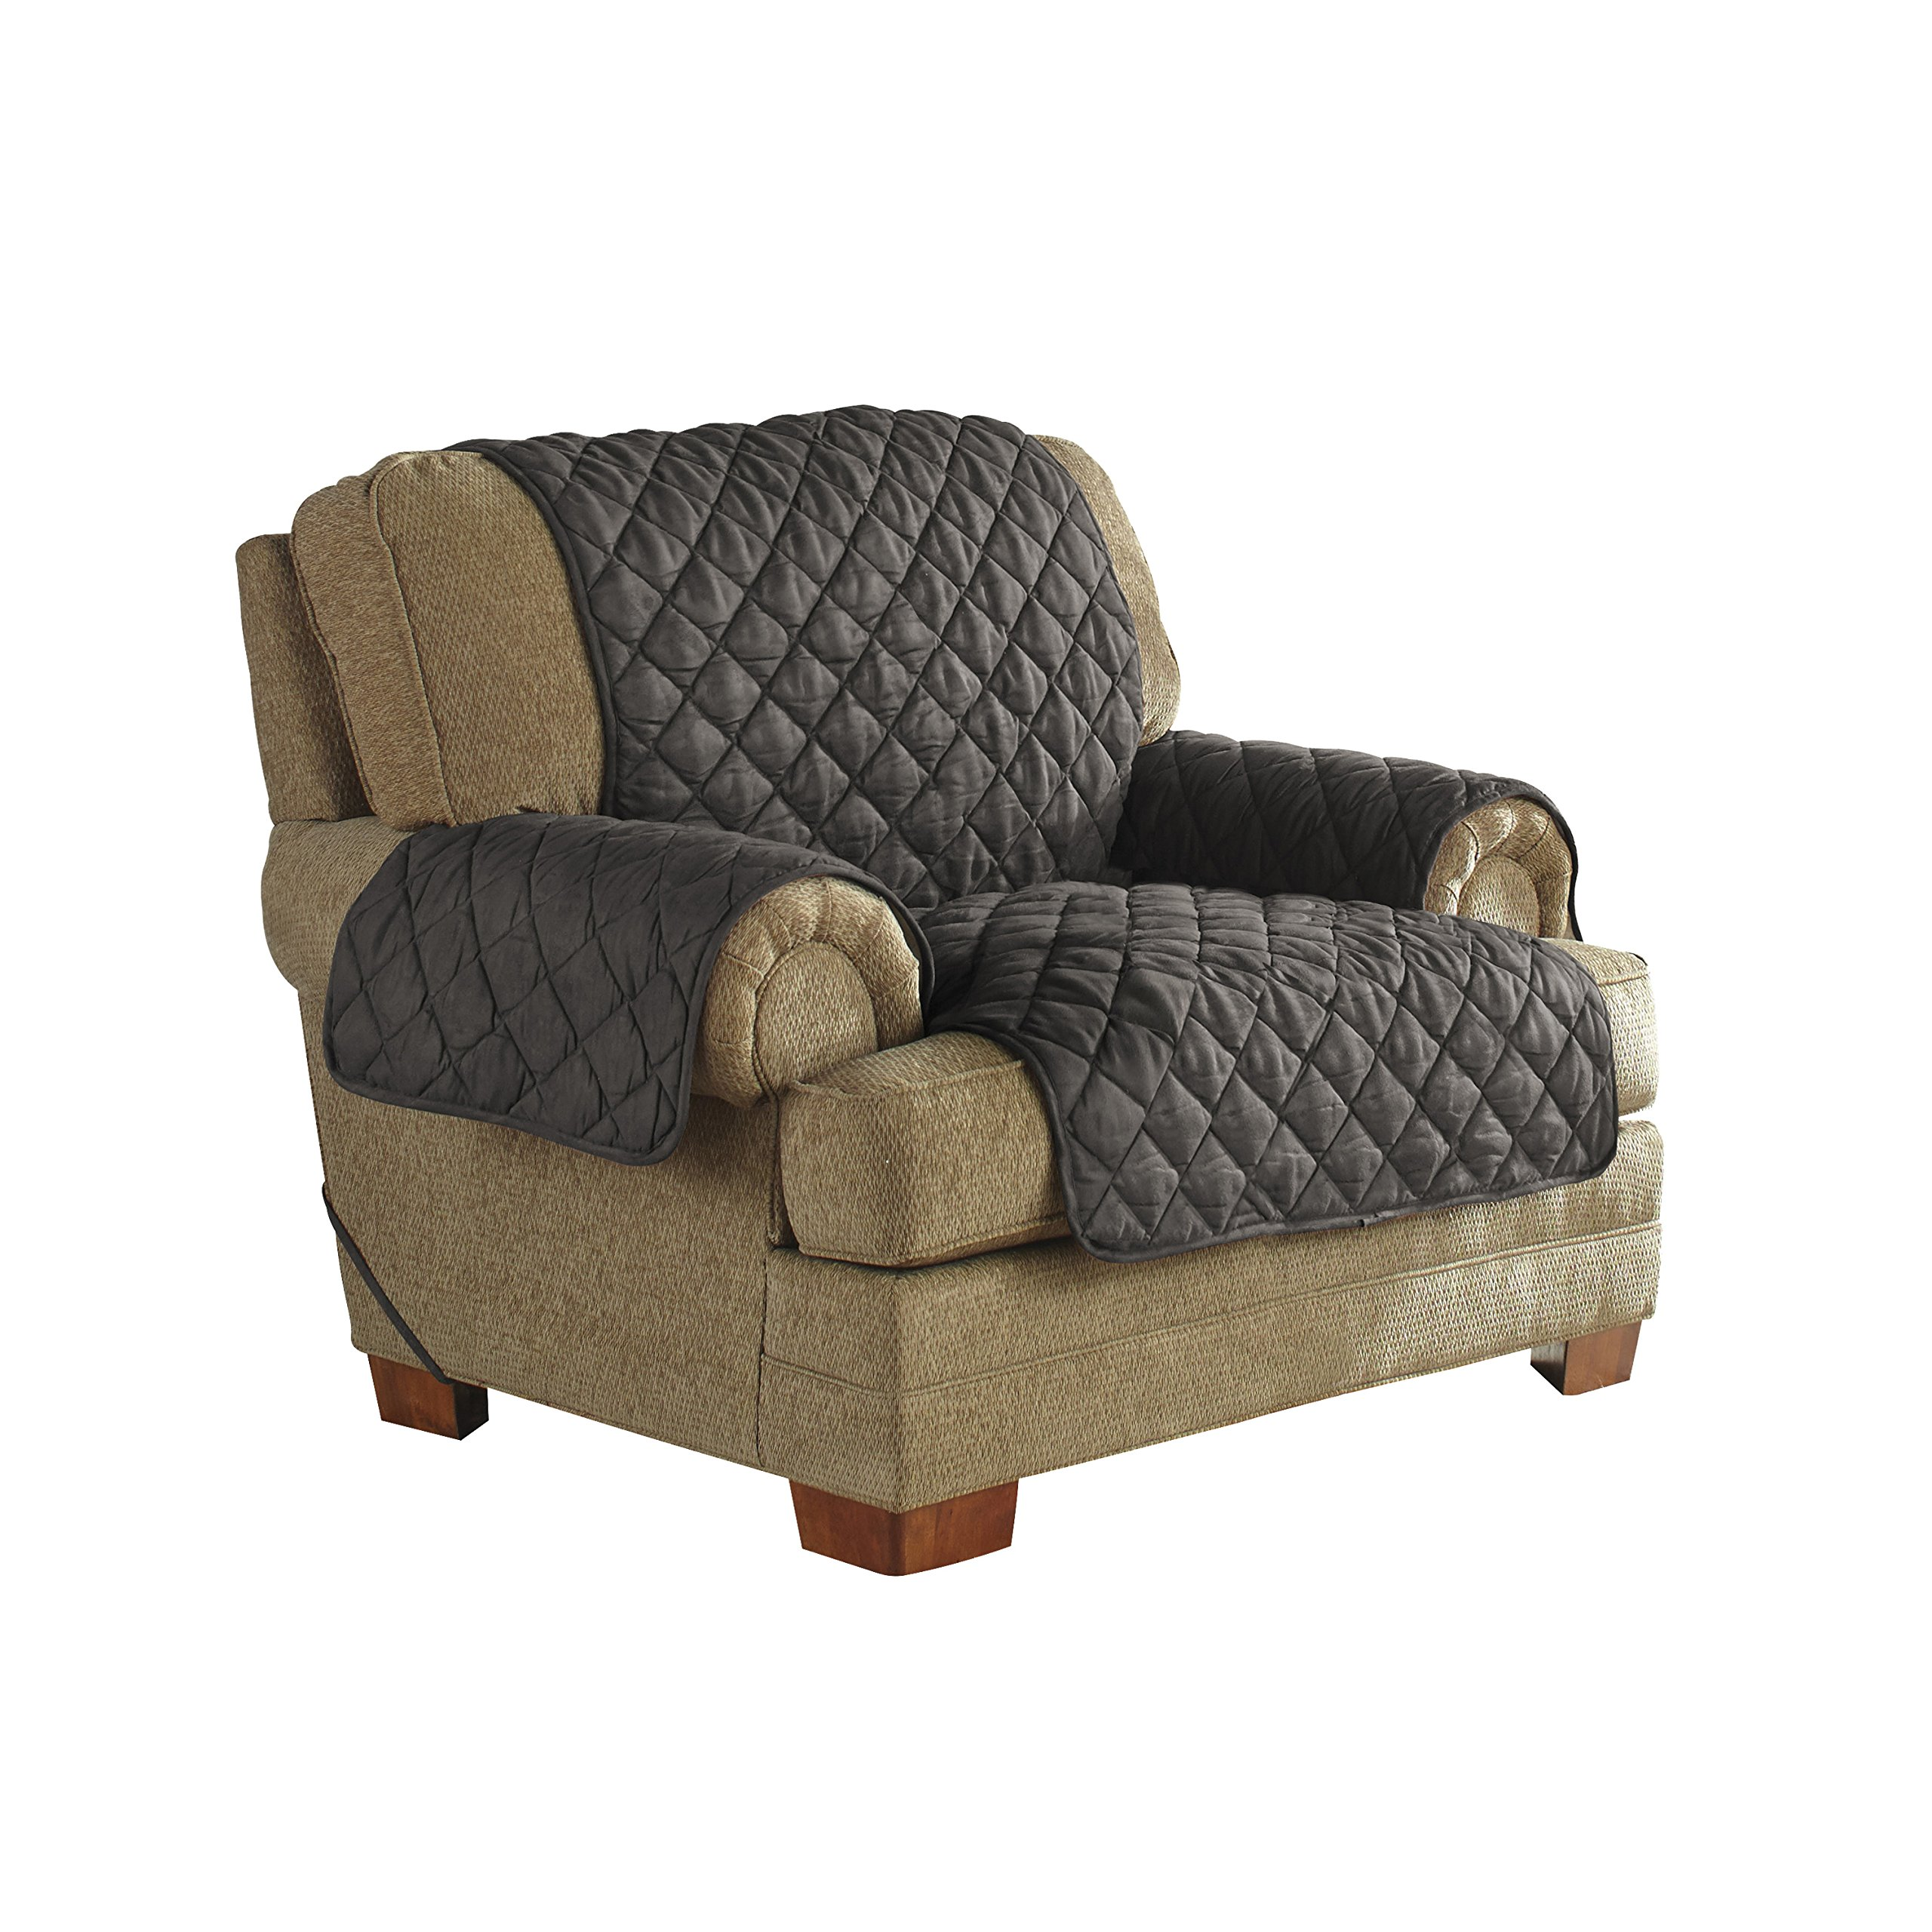 Serta Ultra Suede Waterproof Furniture Chair Protector, Graphite by Serta